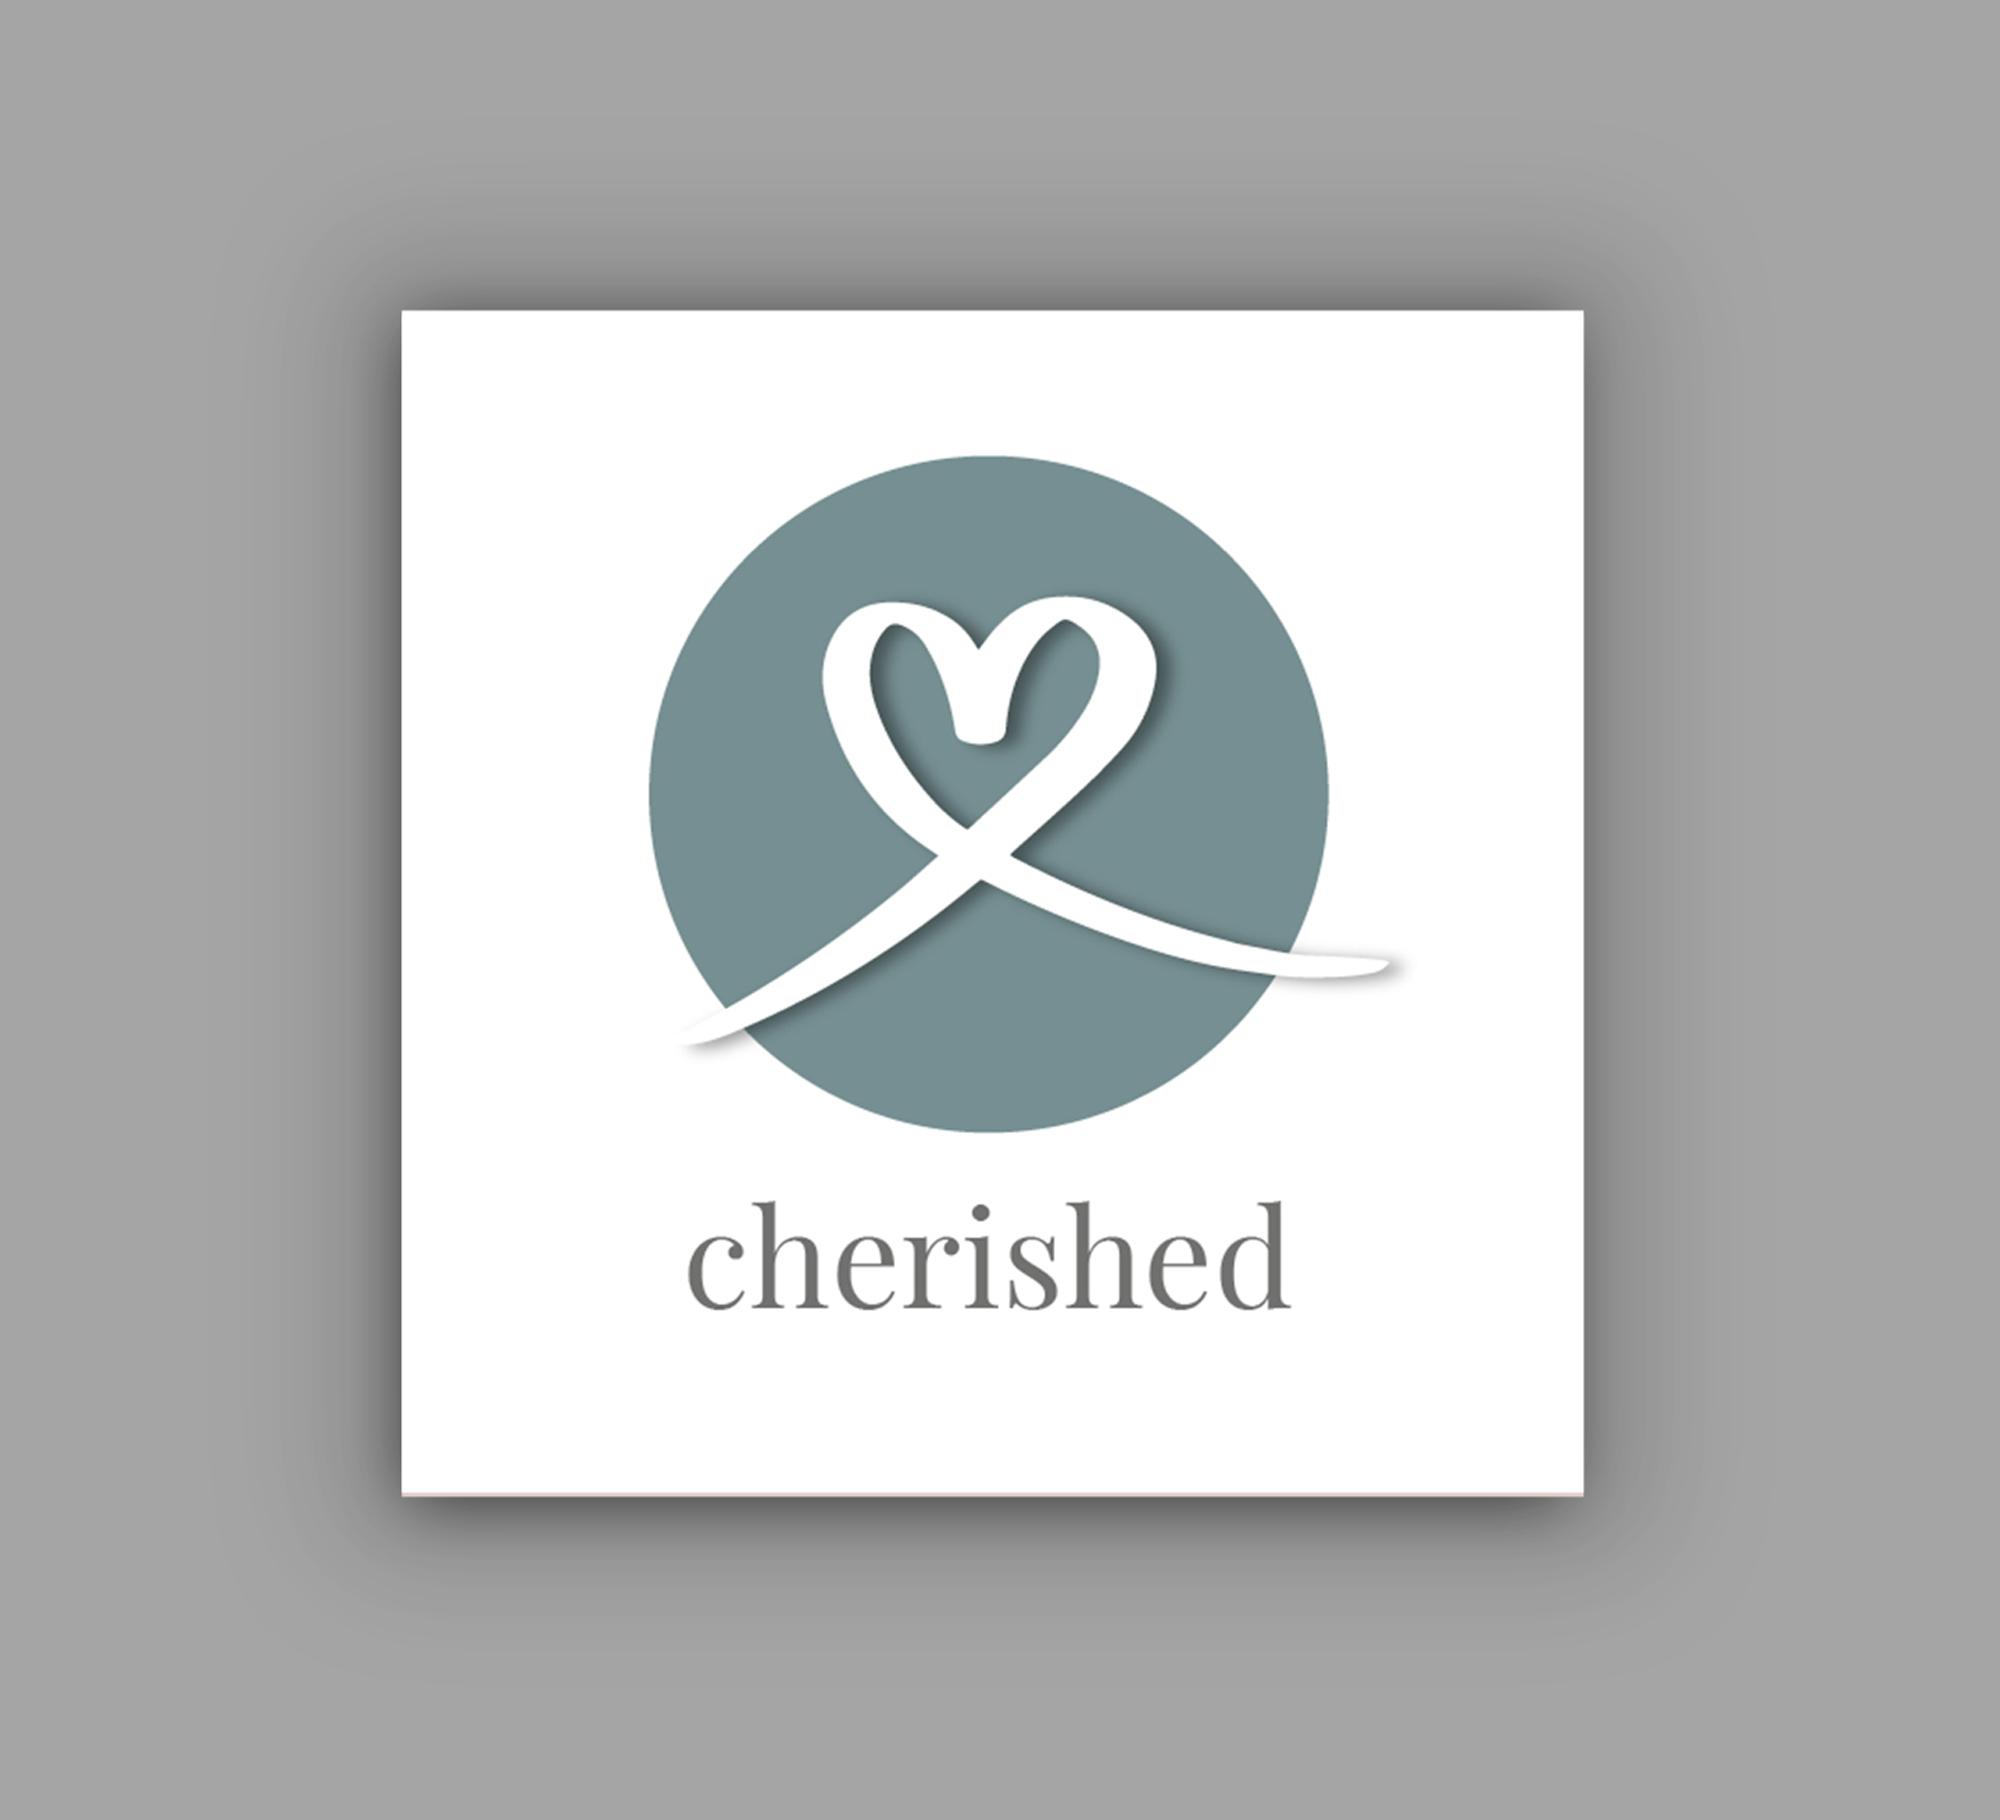 cherished_1